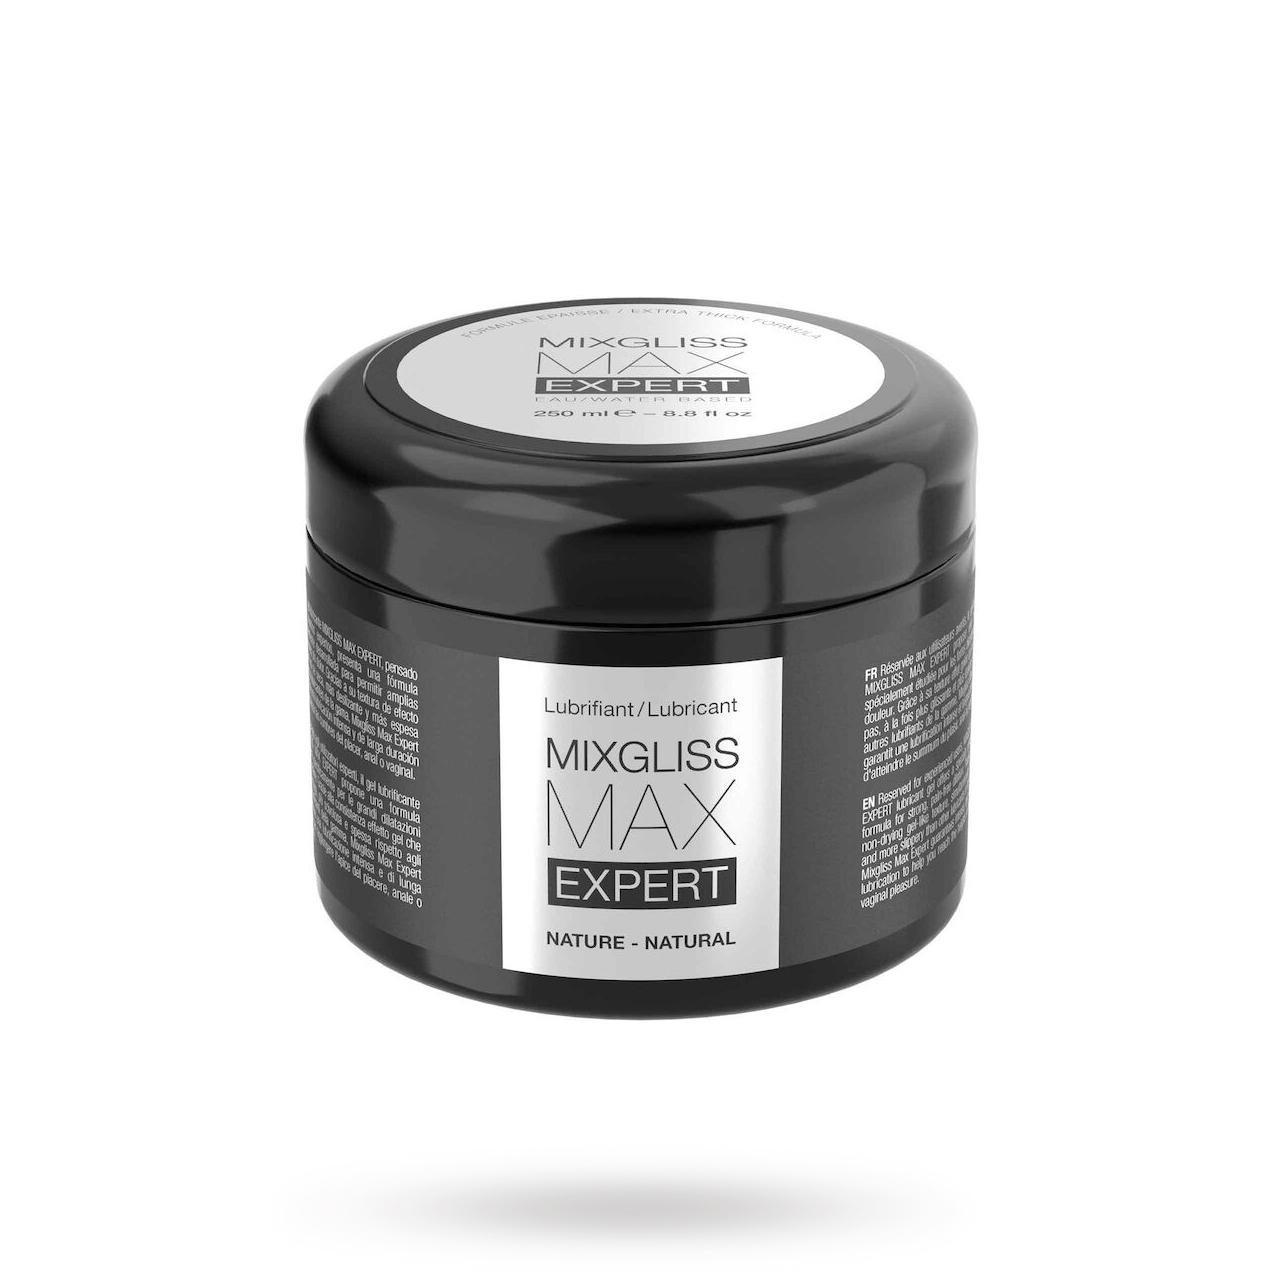 Max Expert Naturell 250ml | GLIDMEDEL ETC., GLIDMEDEL, Fisting, Anala glidmedel, Vattenbaserade glidmedel | Intimast.se - Sexleksaker